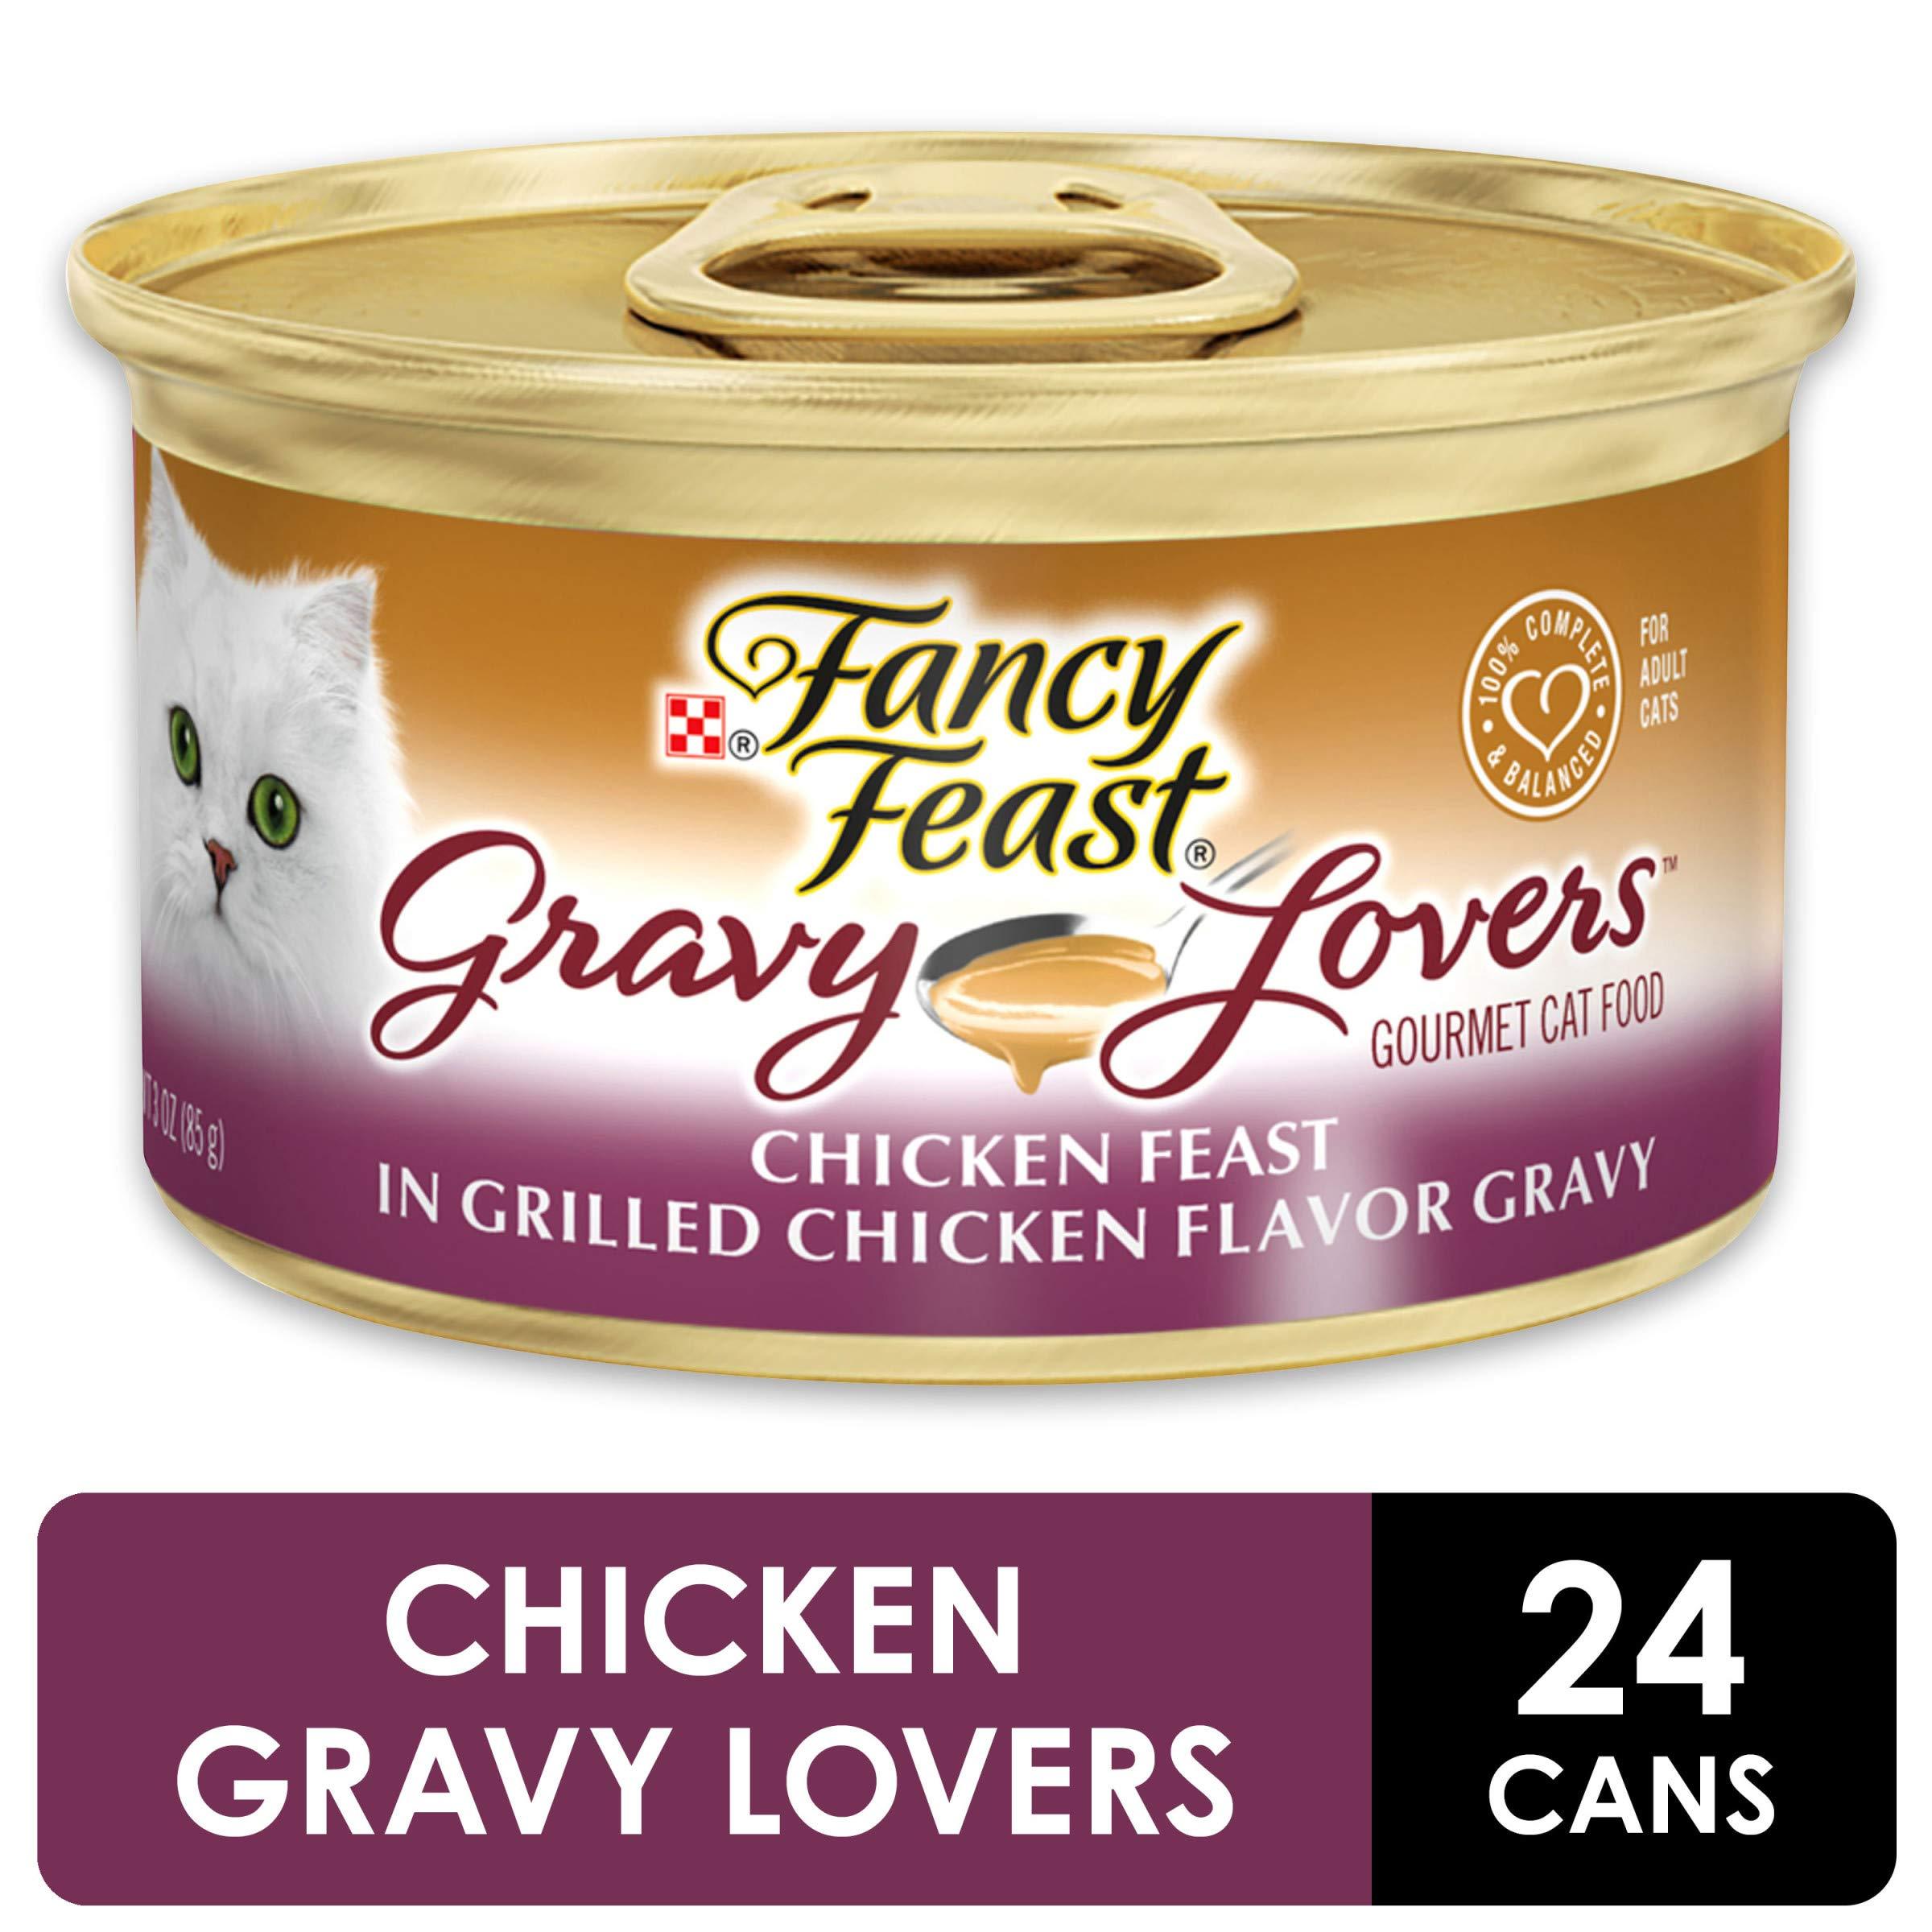 Purina Fancy Feast Gravy Wet Cat Food, Gravy Lovers Chicken Feast in Grilled Chicken Flavor Gravy - (24) 3 oz. Cans by Purina Fancy Feast